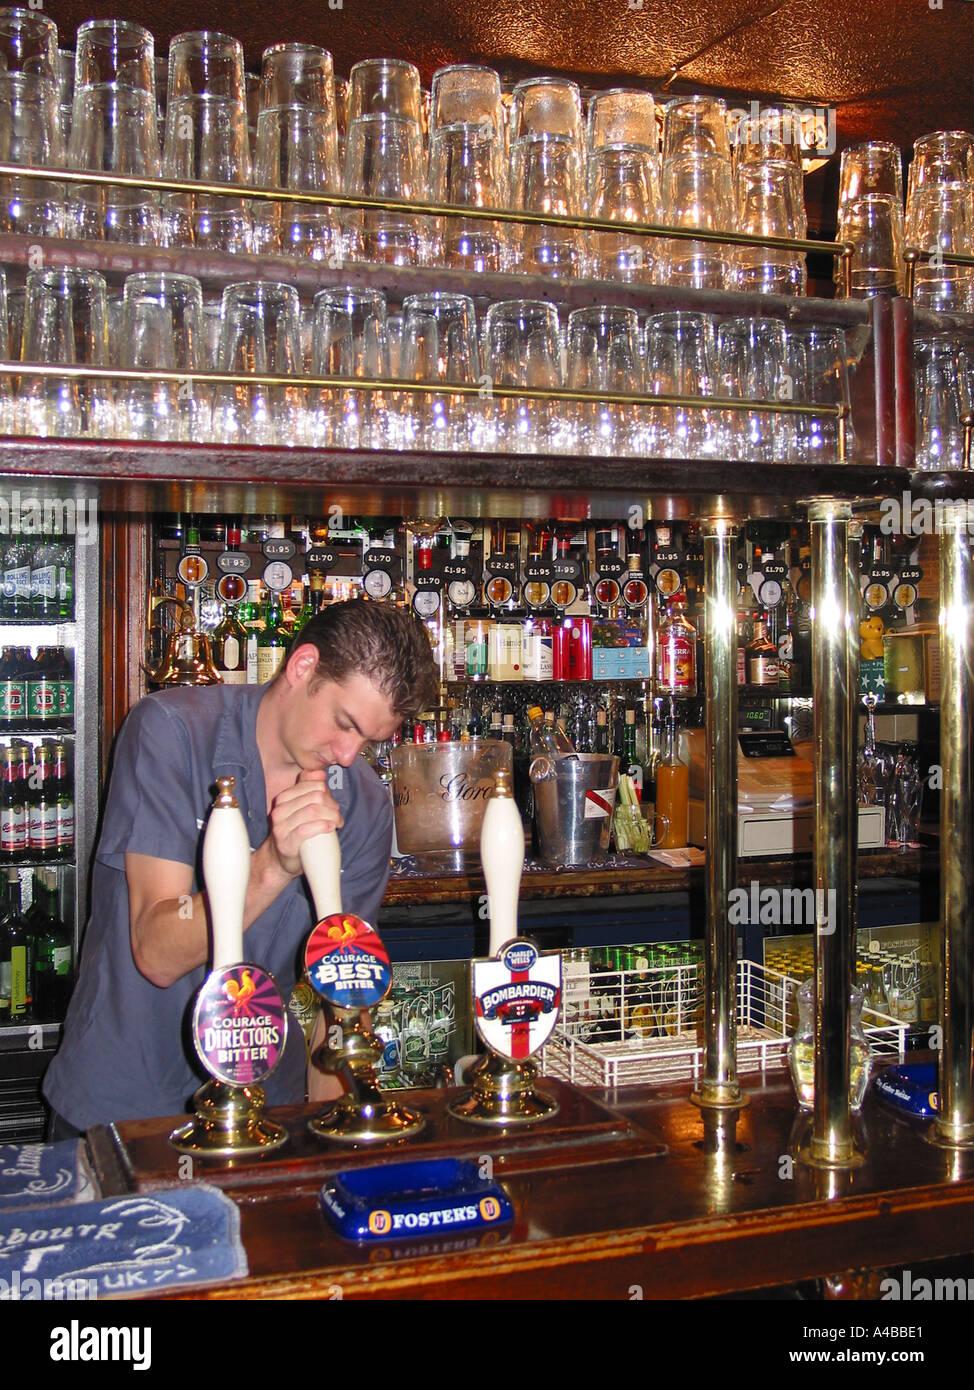 Barman serving Traditional British Pub Scene - Stock Image